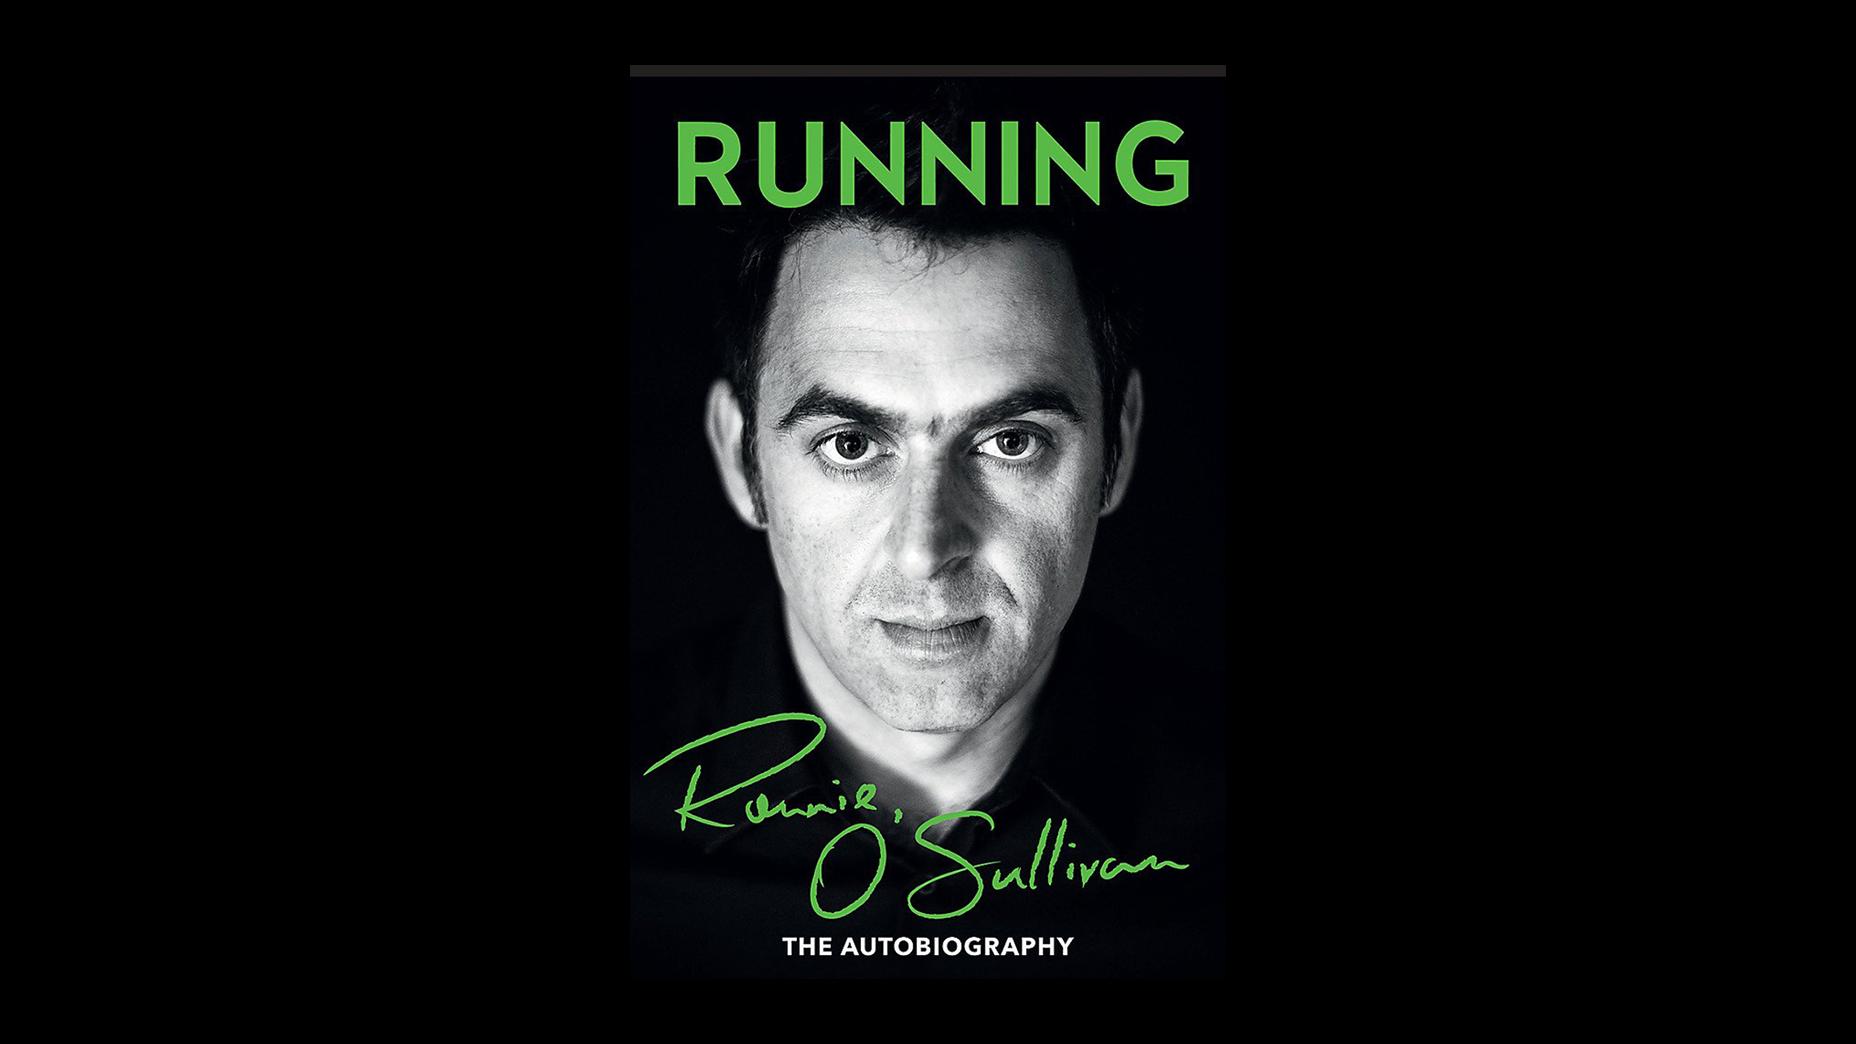 Running by Ronnie O'Sullivan